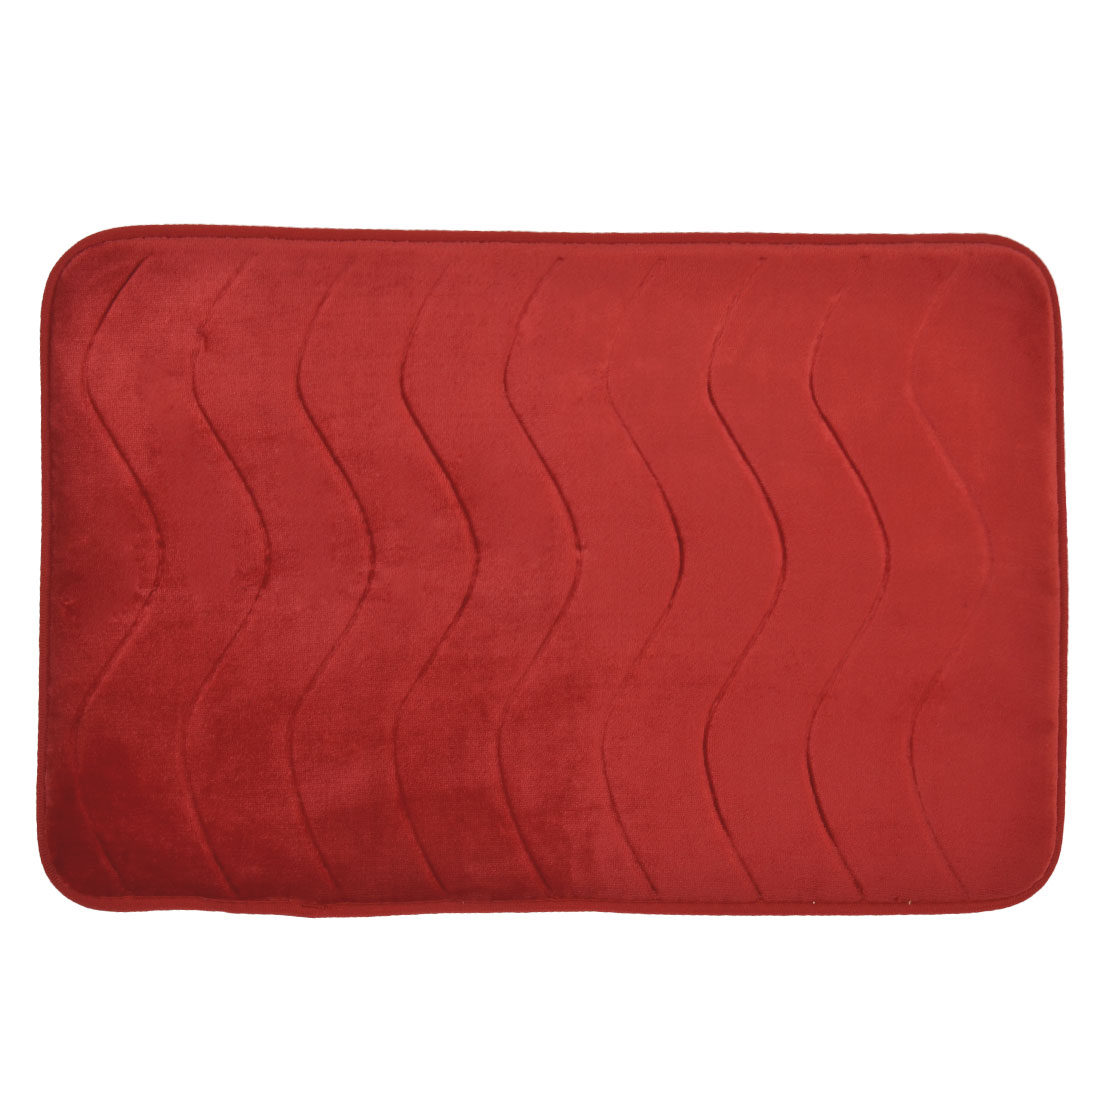 58cm x 40cm Red Villus Surface Wavy Pattern Absorbent Non-slip Pad Shower Rug